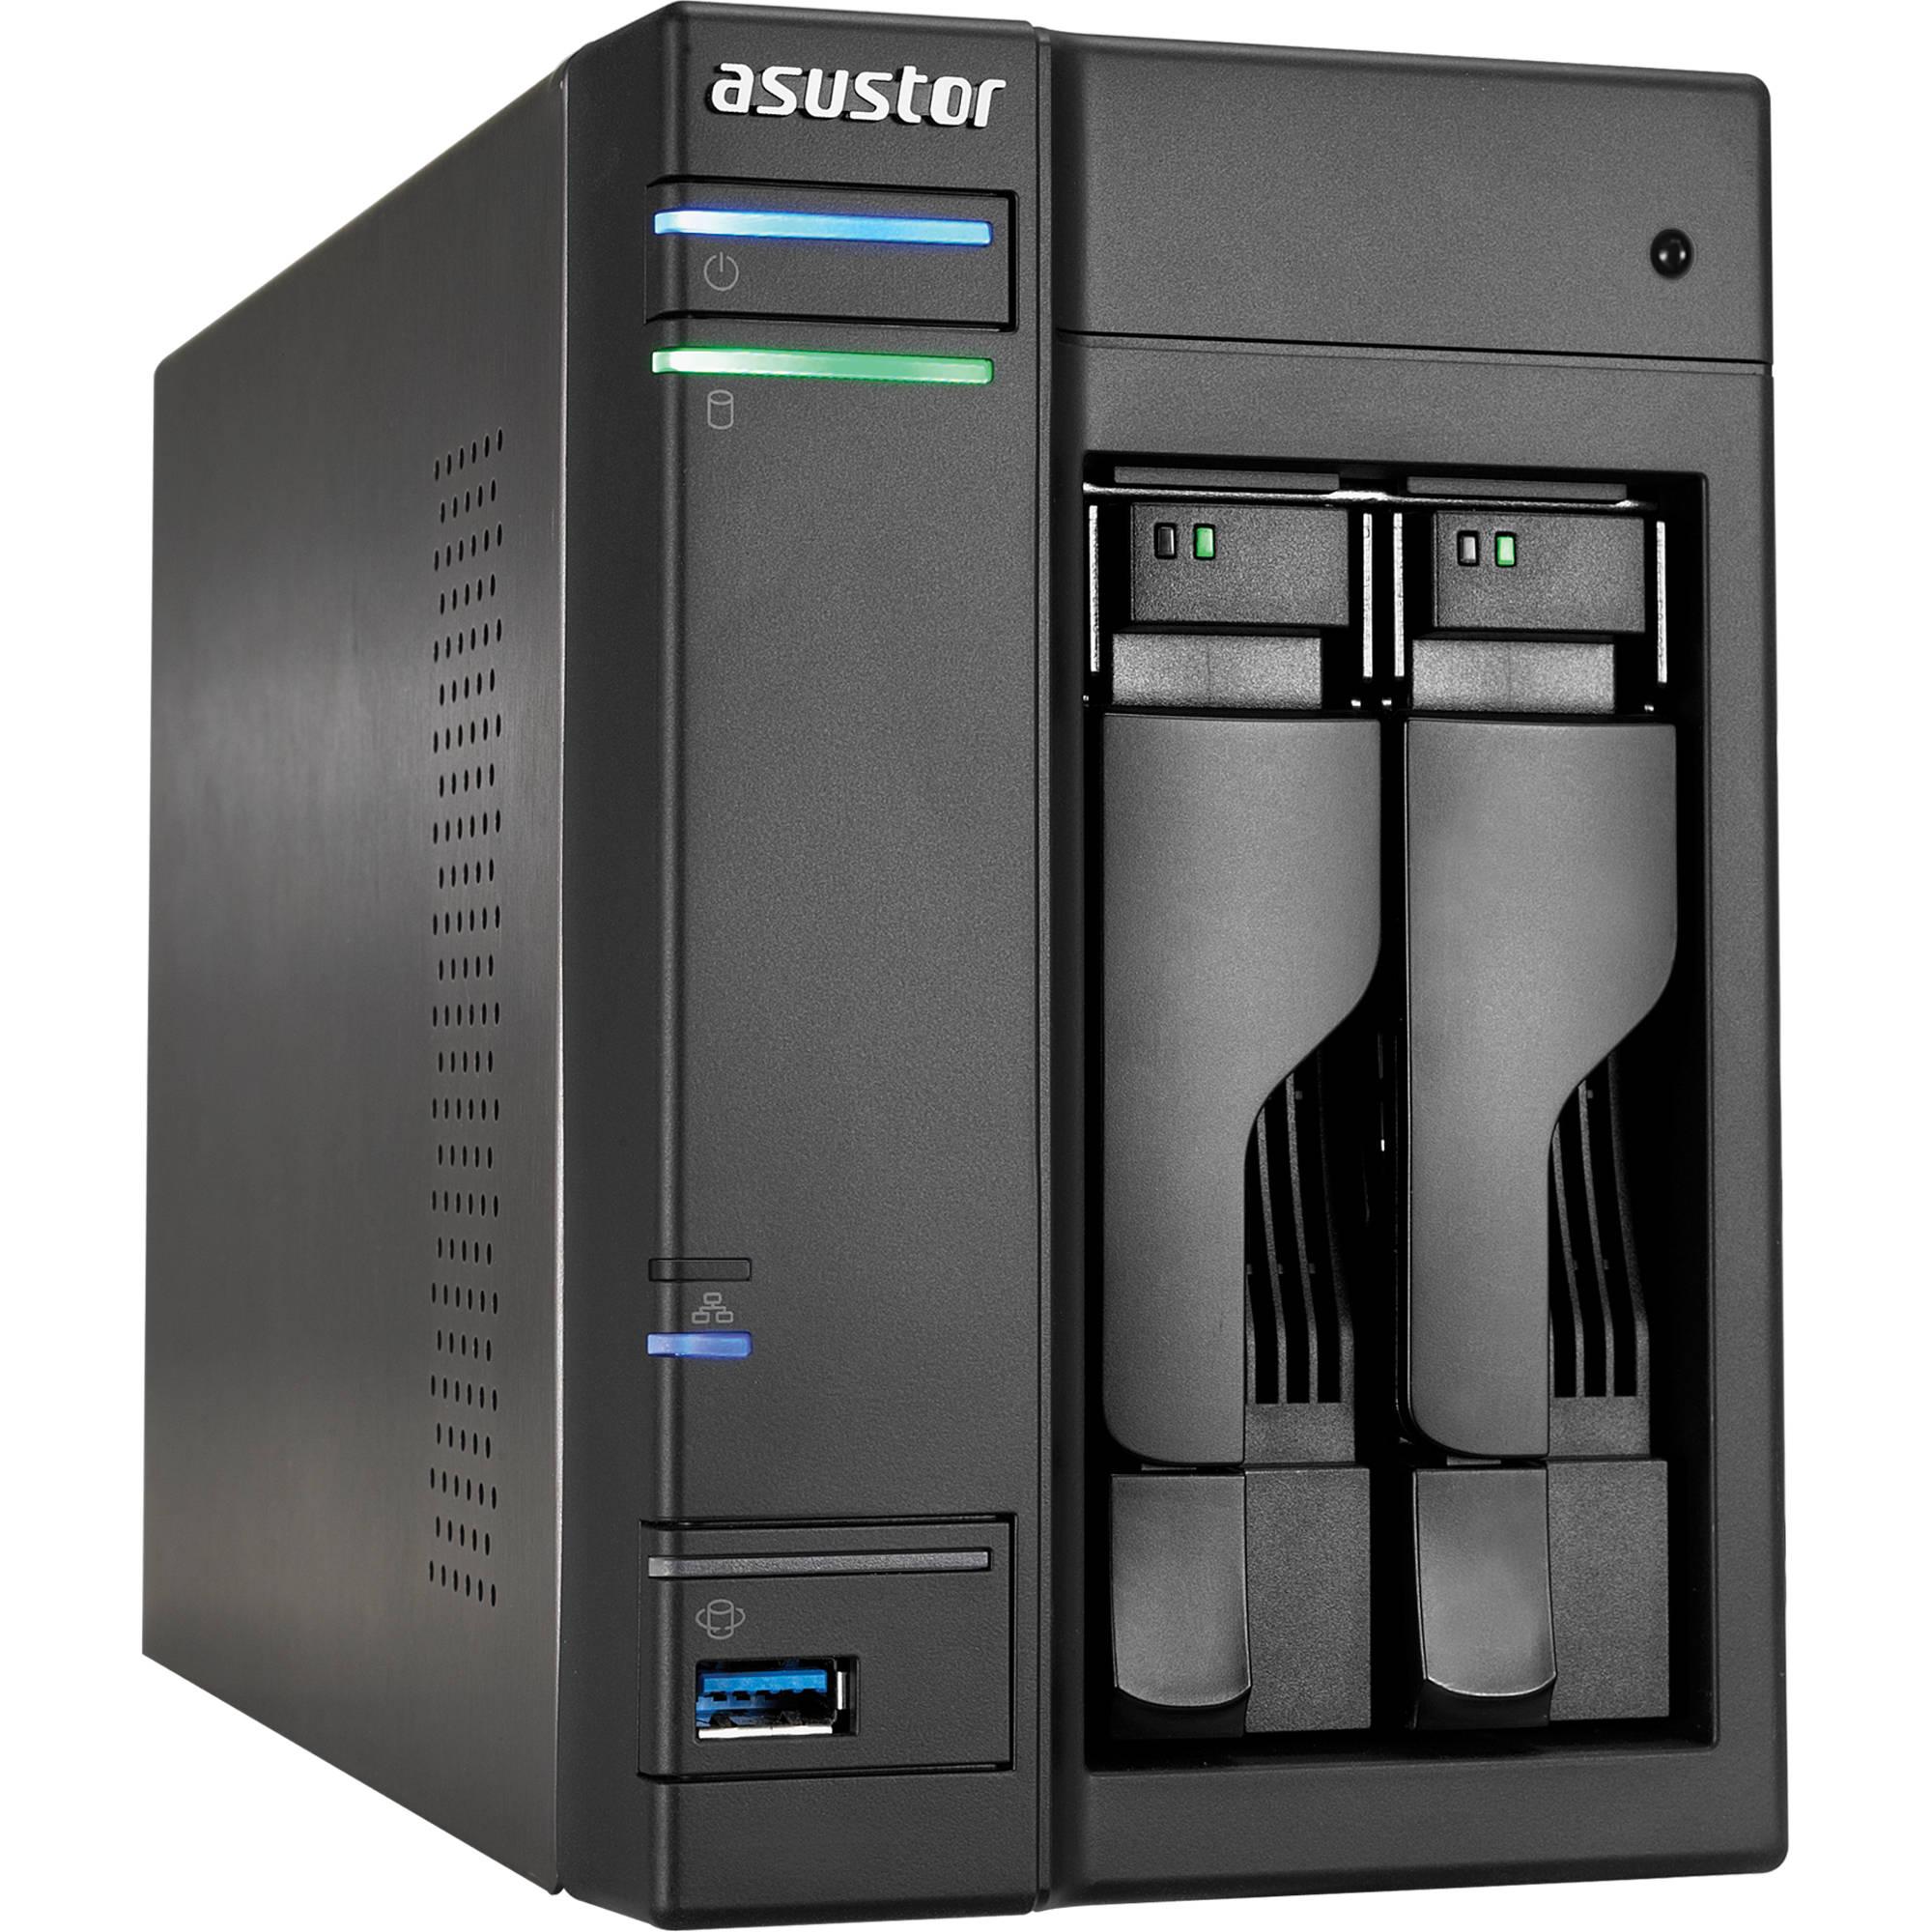 Asustor AS 202TE 2 Bay Data Storage Server Diskless AS 202TE